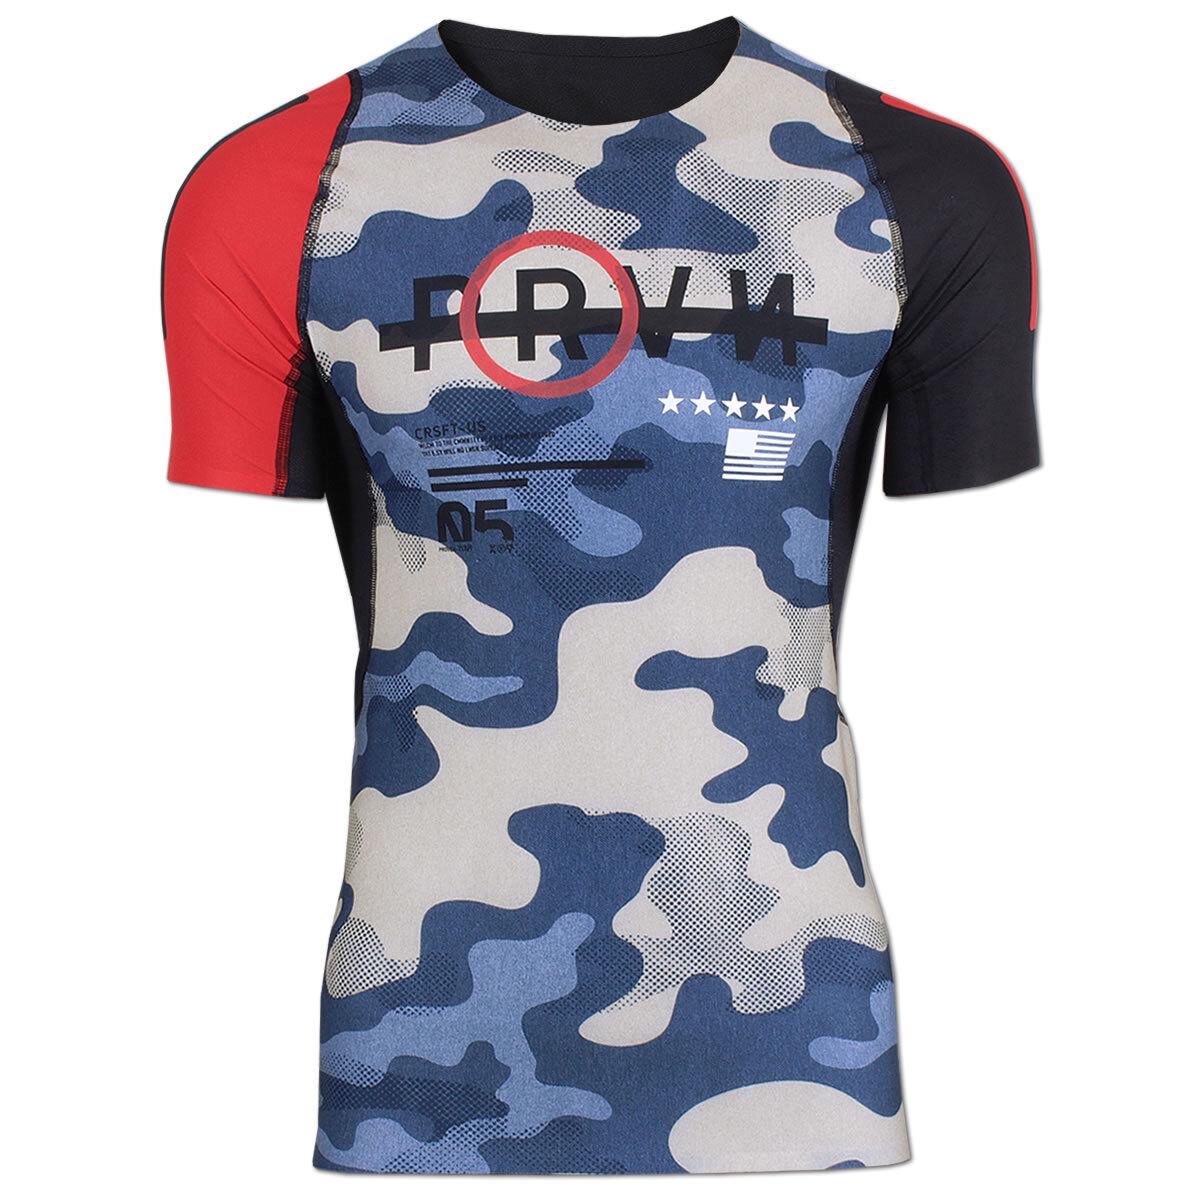 Reebok Herren CrossFit Camo Compression Shirt Trainingsshirt Fitness Running